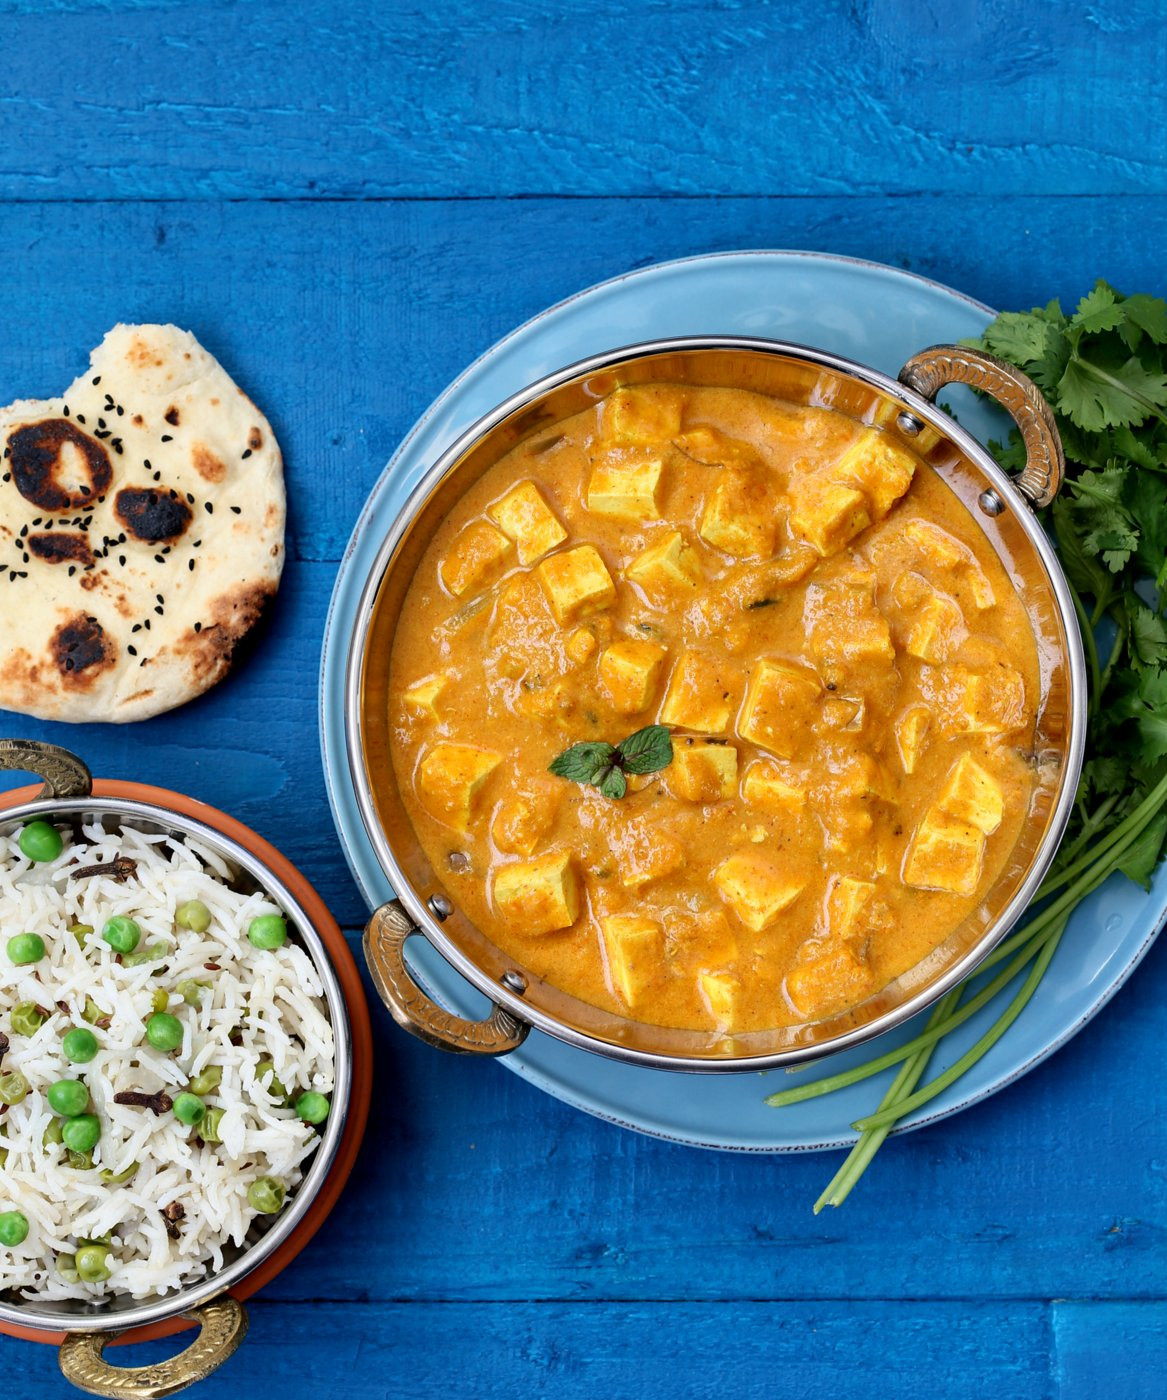 Tofu Curry Recipes  Mango Tofu Curry Vegan Richa's Indian Kitchen Giveaway